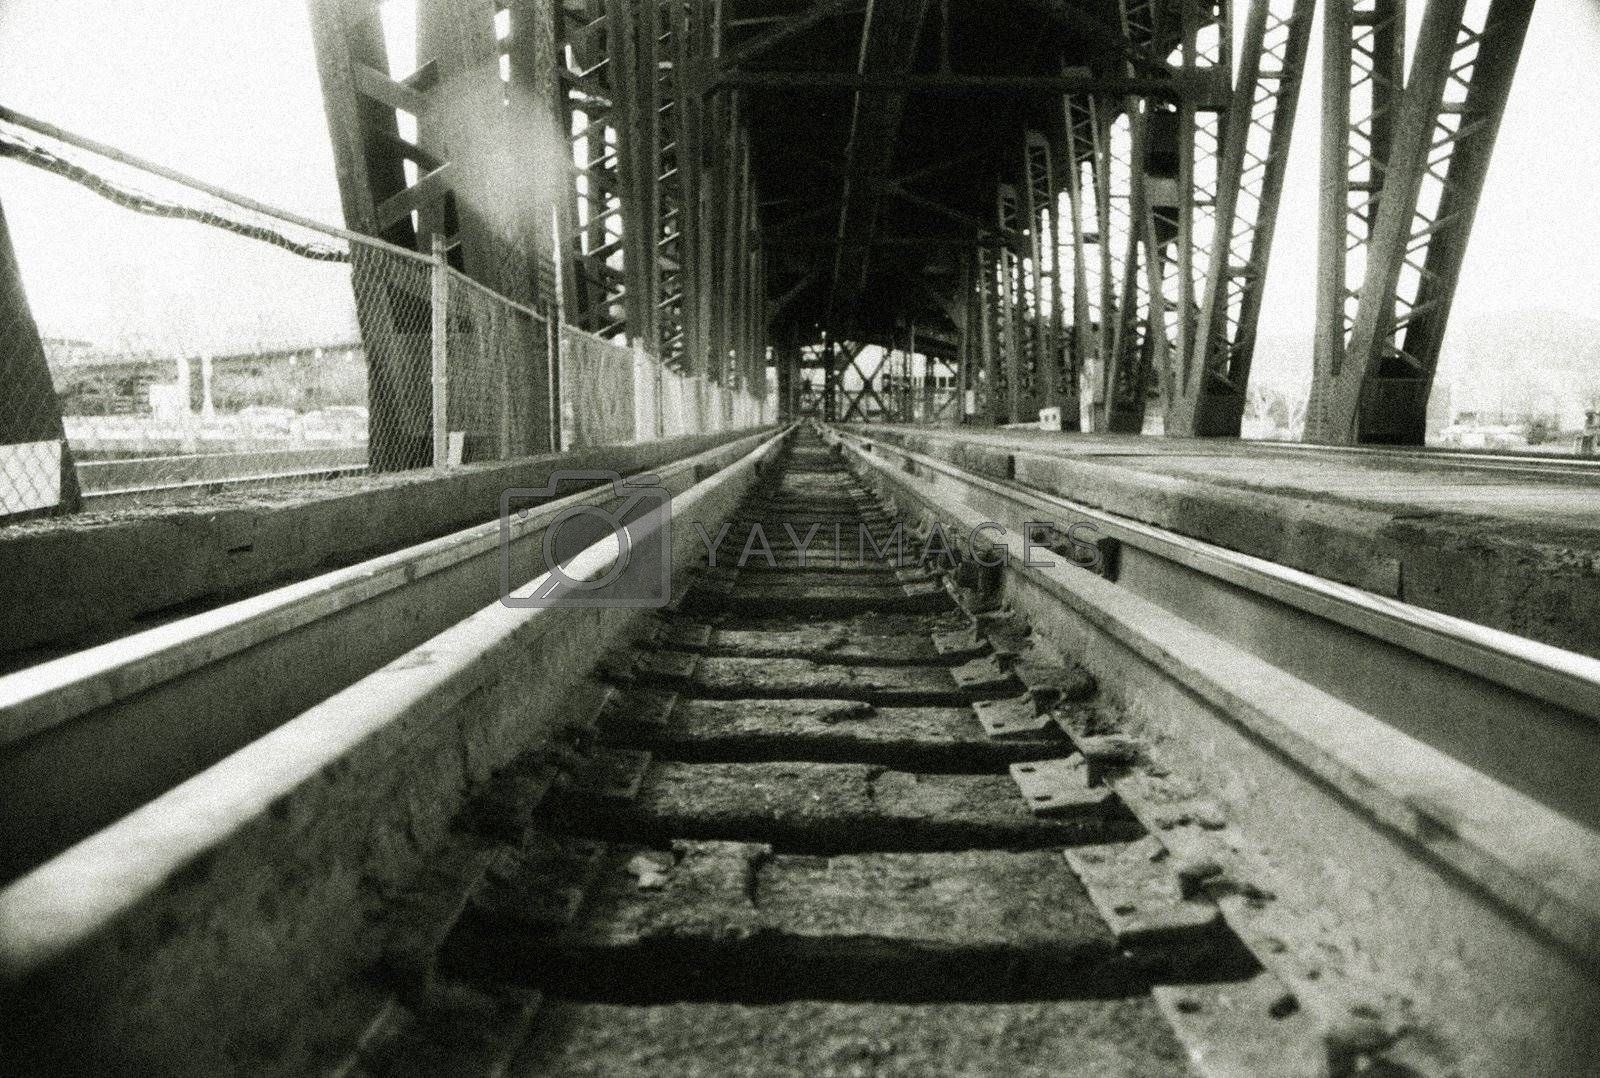 Railroad tracks on bridge disappearing into horizon